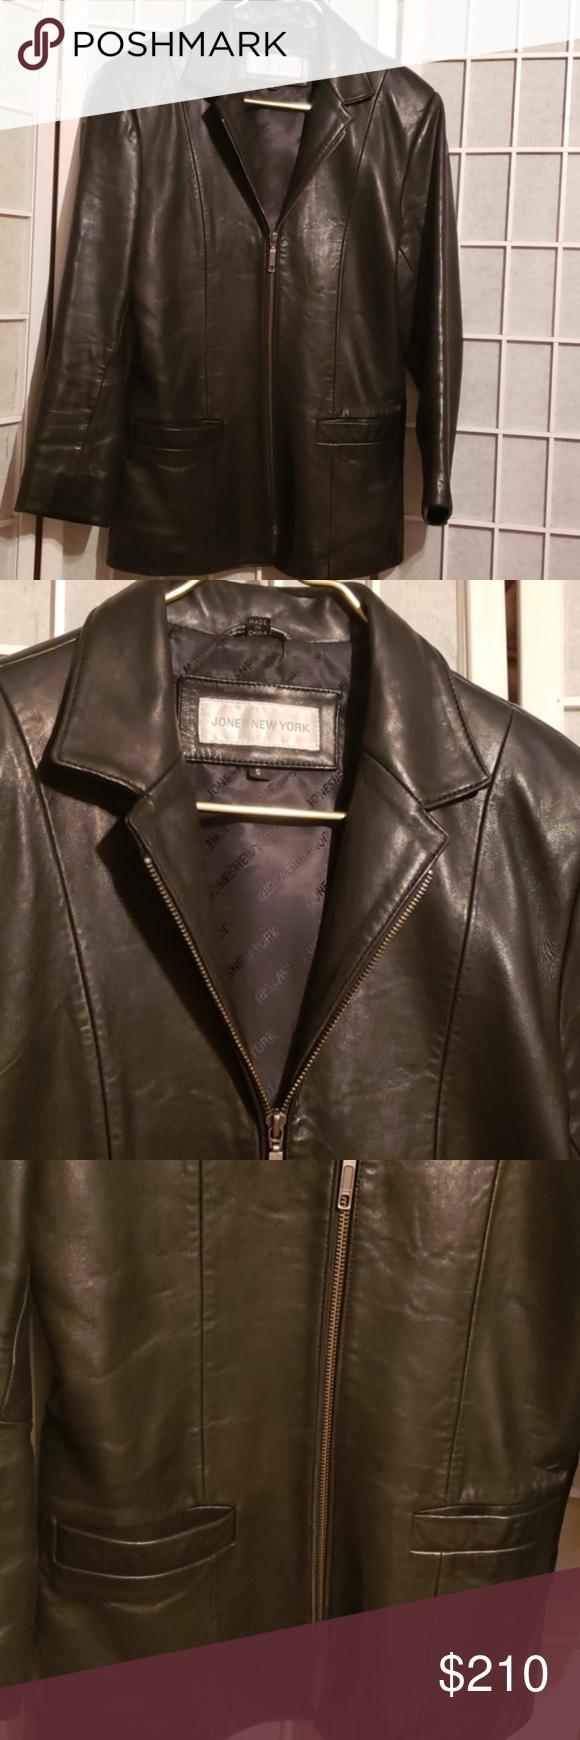 Jones New York Black Leather Zip Jacket Sz S Jones New York Black Leather Zipper Closure Jacket Sz S Previously Worn Wel Zip Jackets Jones New York Jackets [ 1740 x 580 Pixel ]